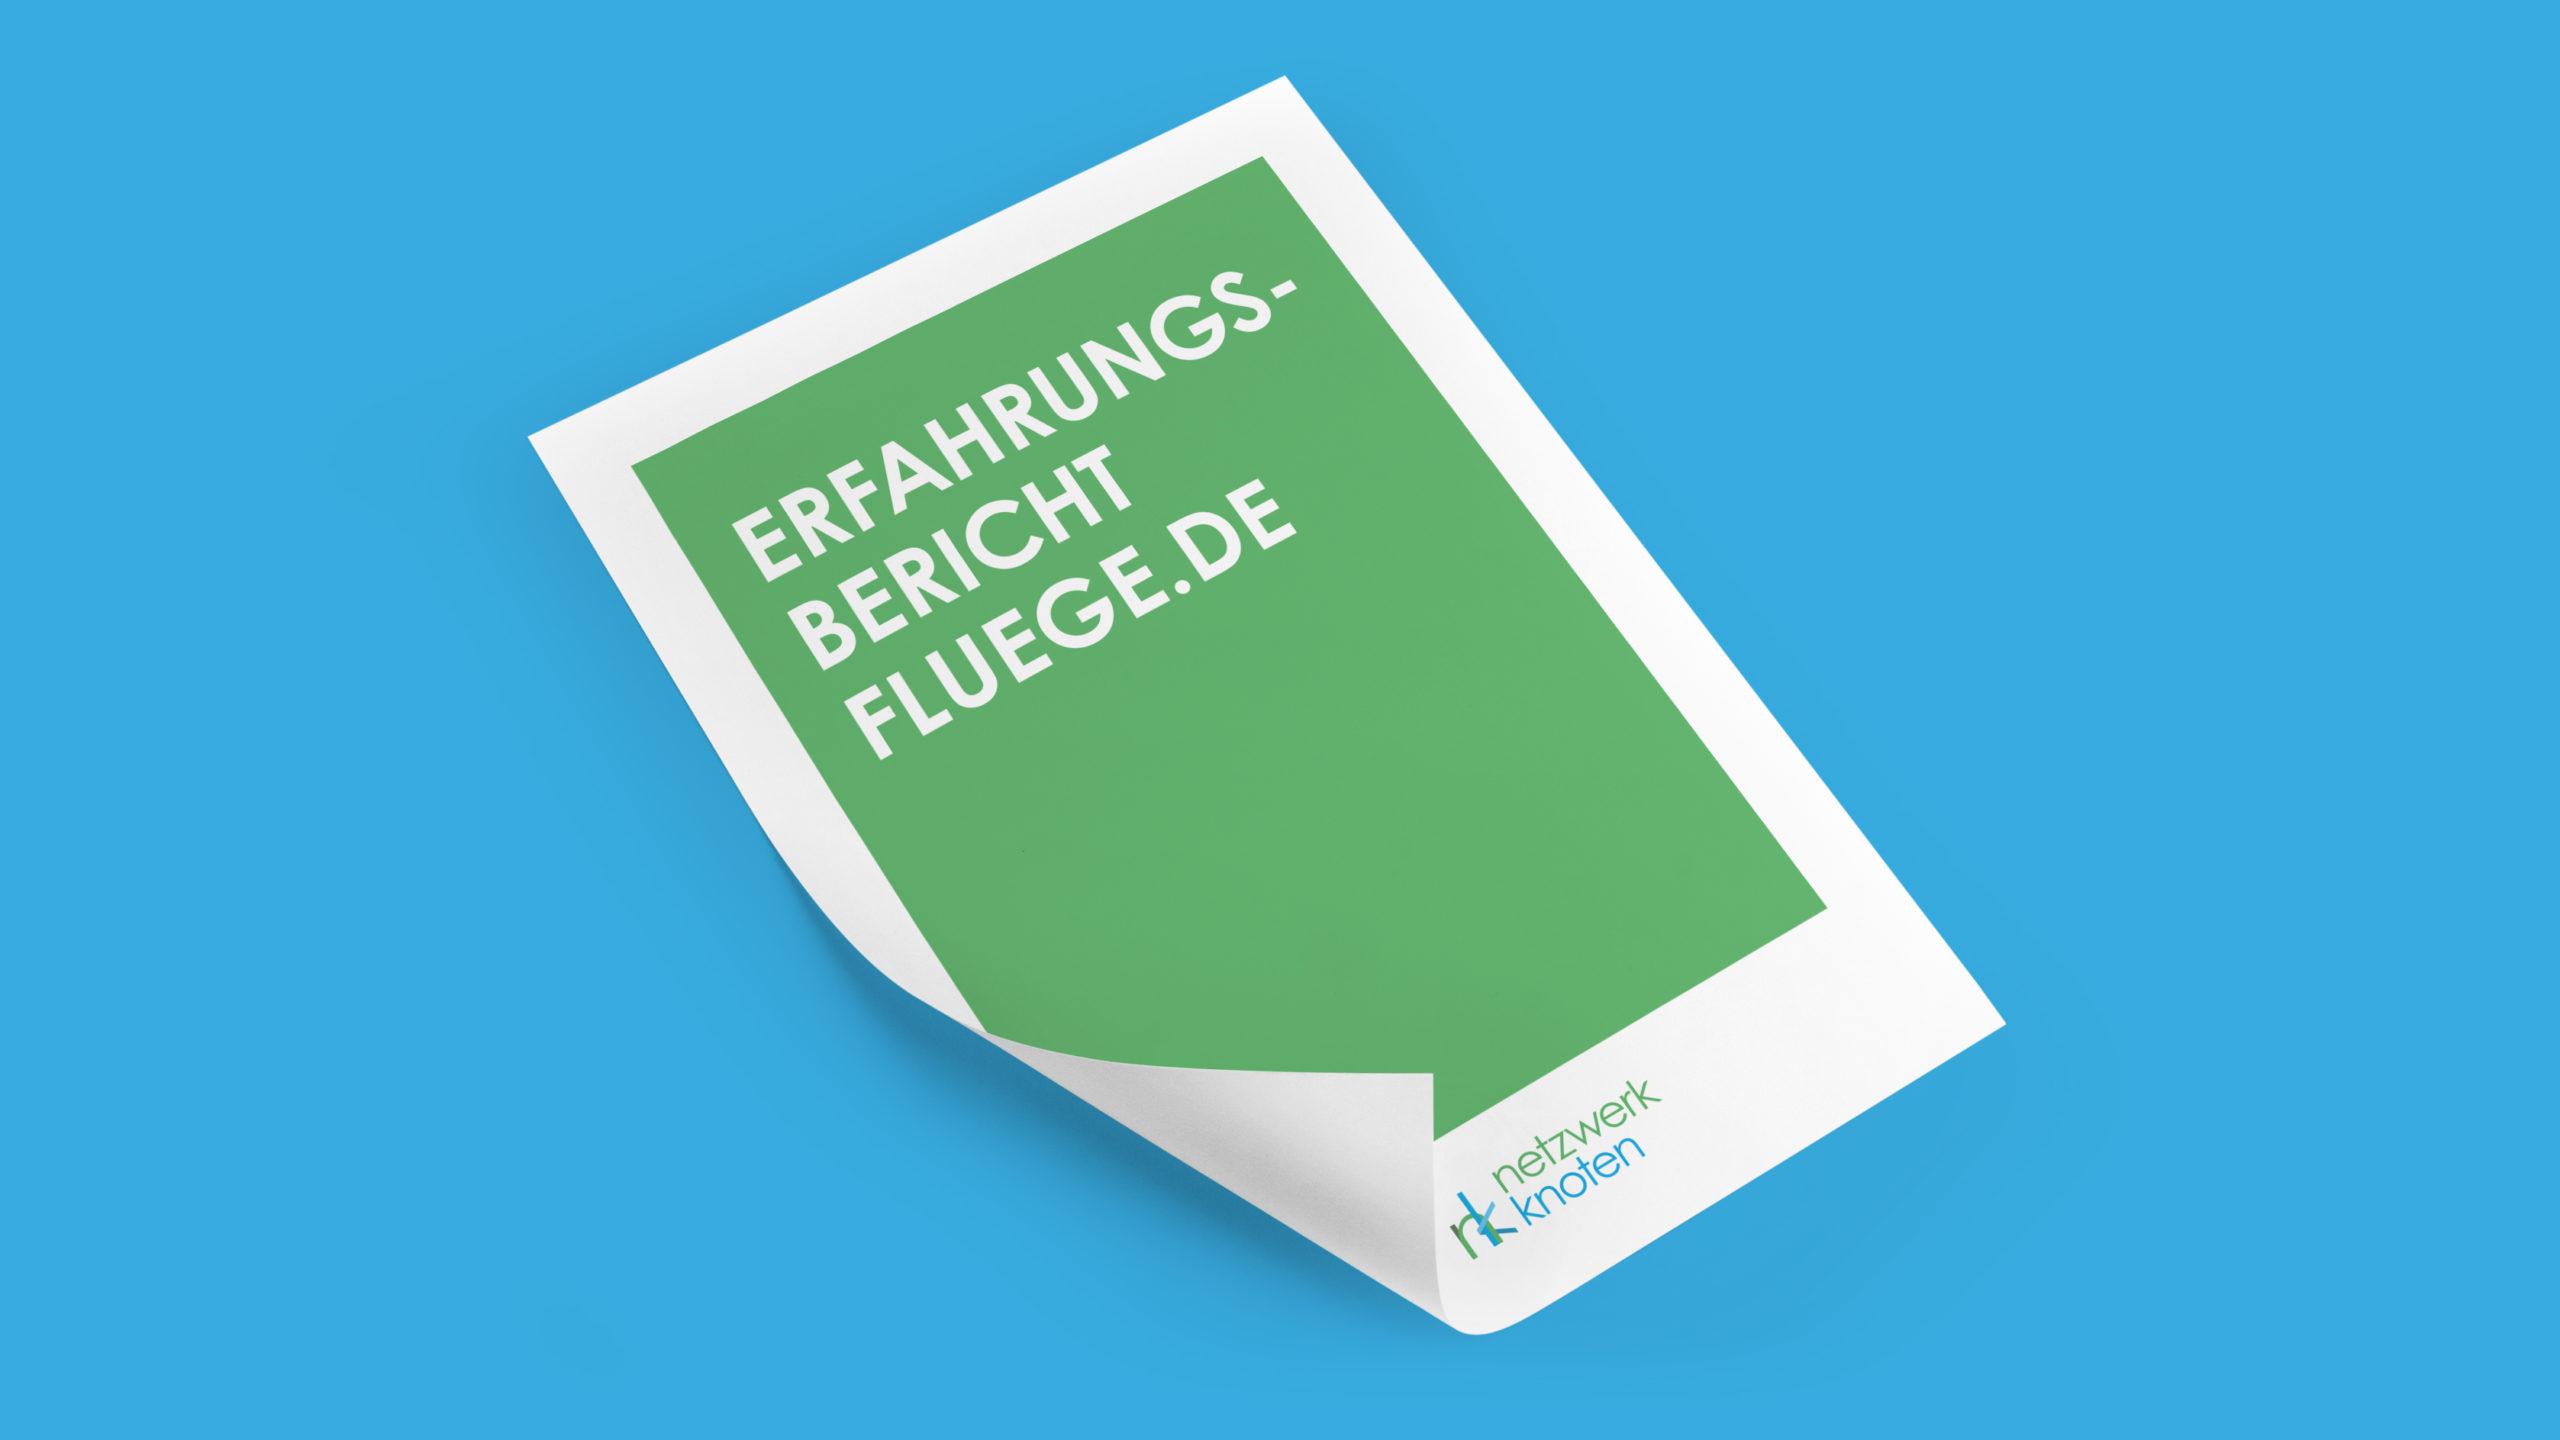 netzwerkknoten_unternehmensberatung_berlin_erfahrungsbericht_fluege